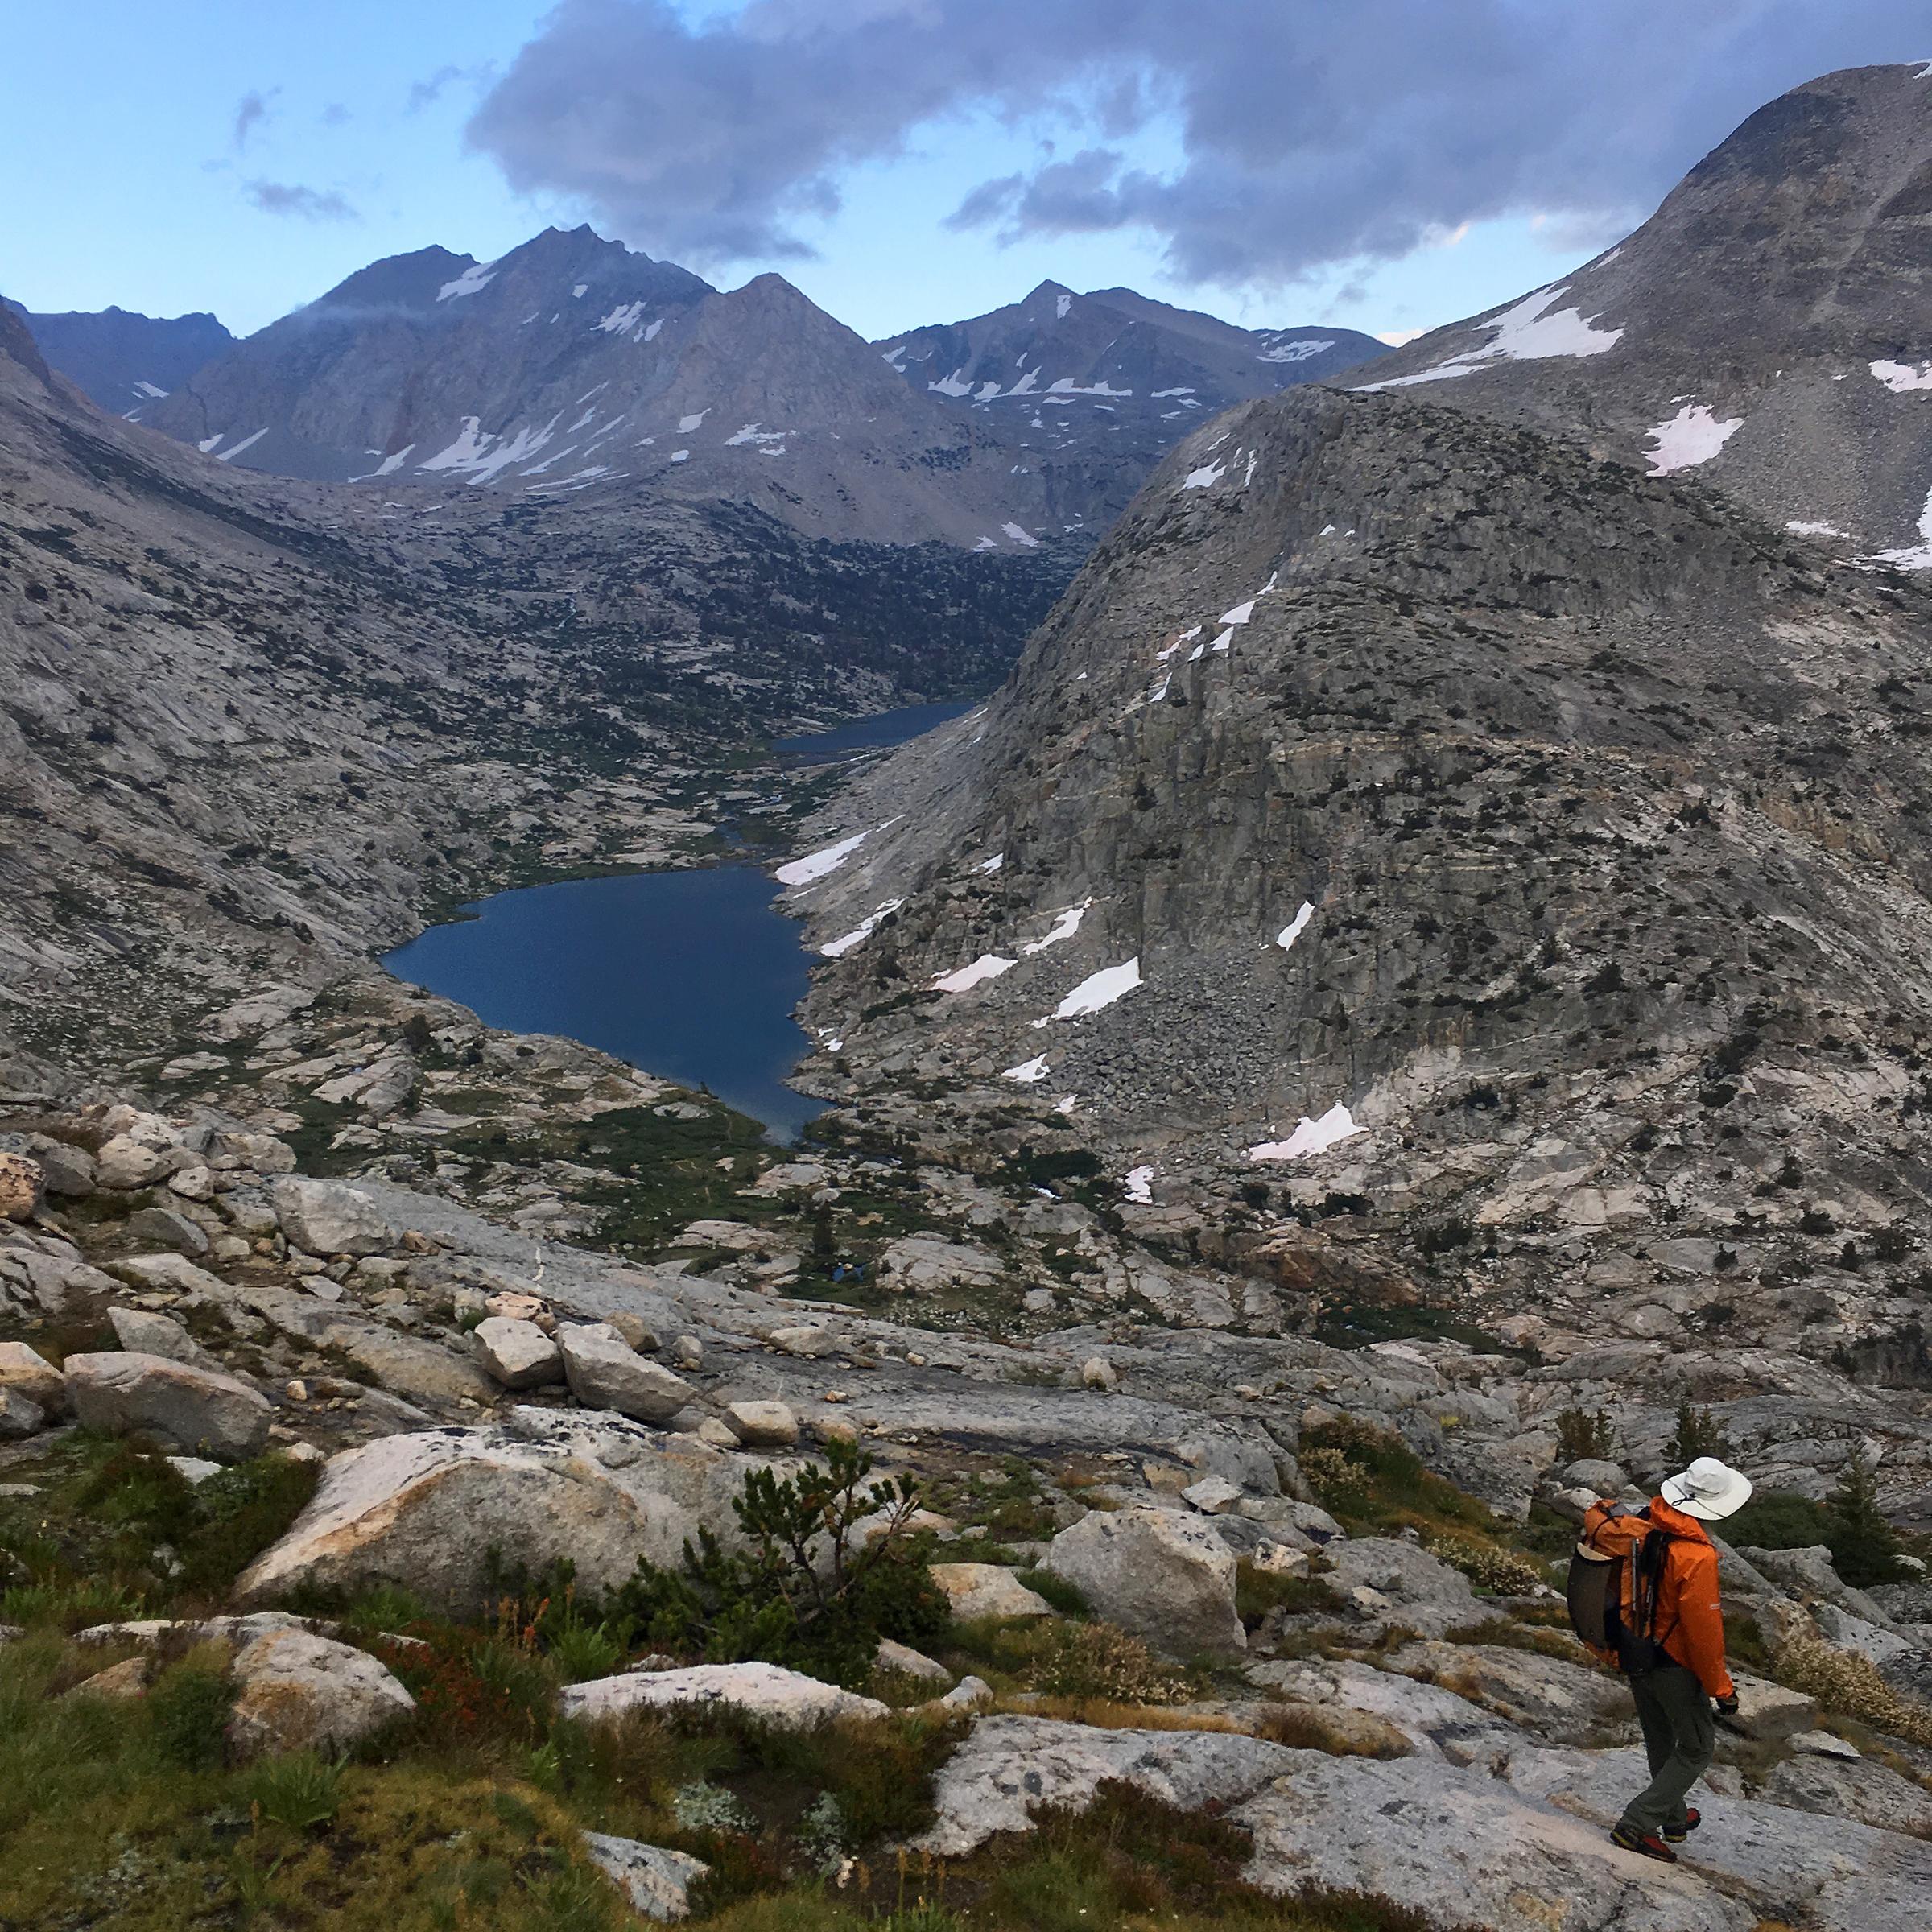 trailname-backstroke-sierra-high-route-2017_1023.jpg